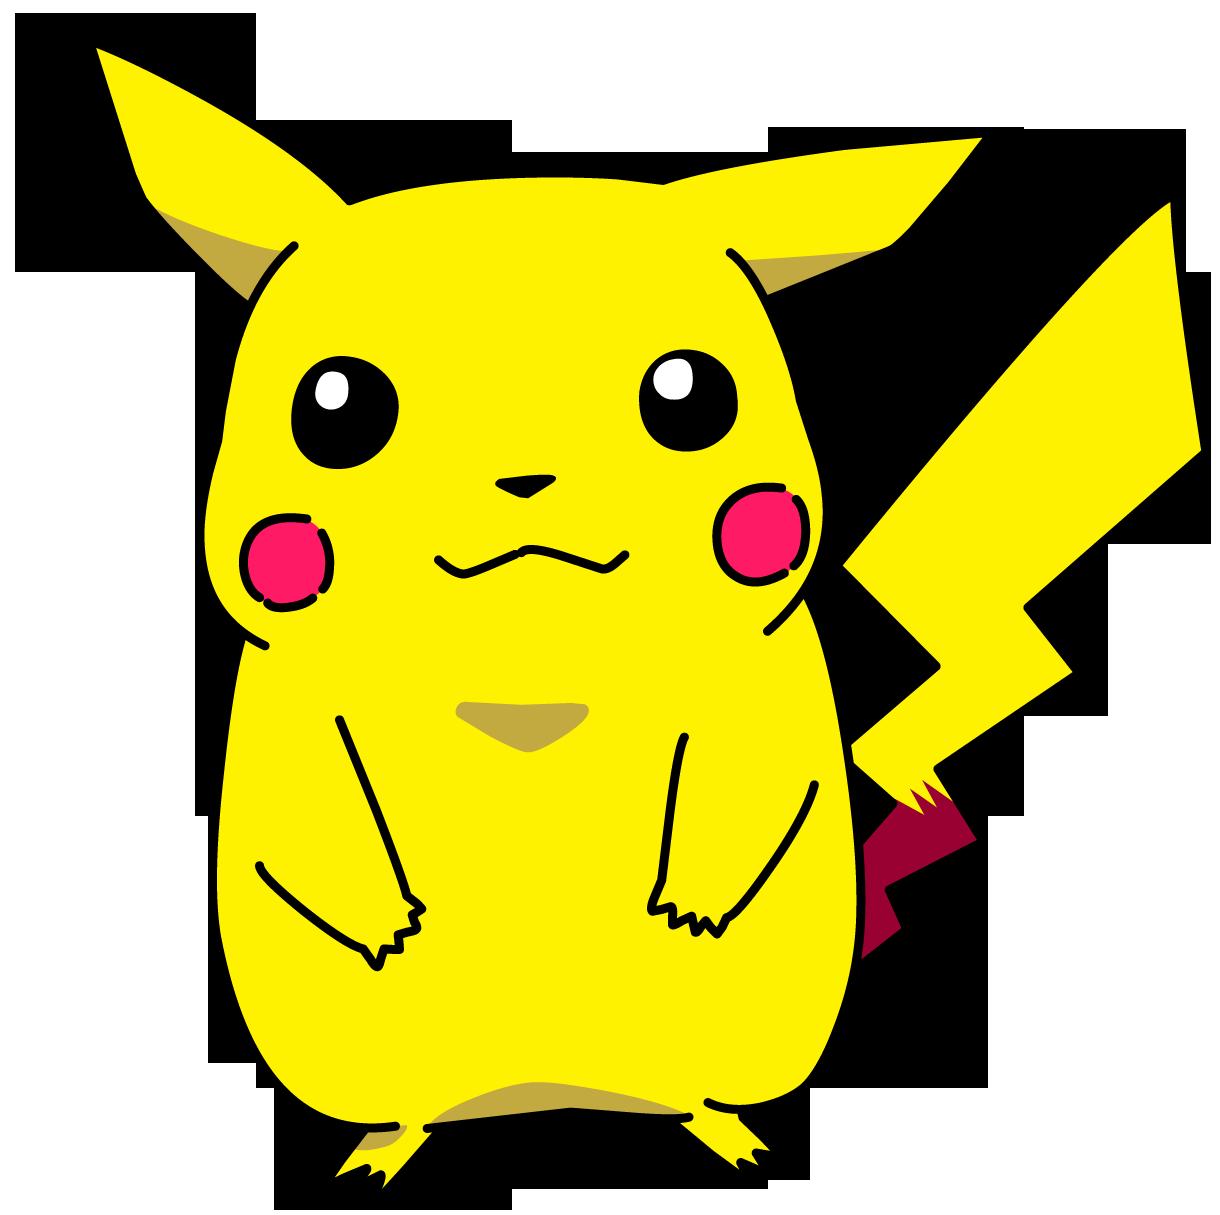 Pikachu clipart transparent background Pikachu transparent background PNG with